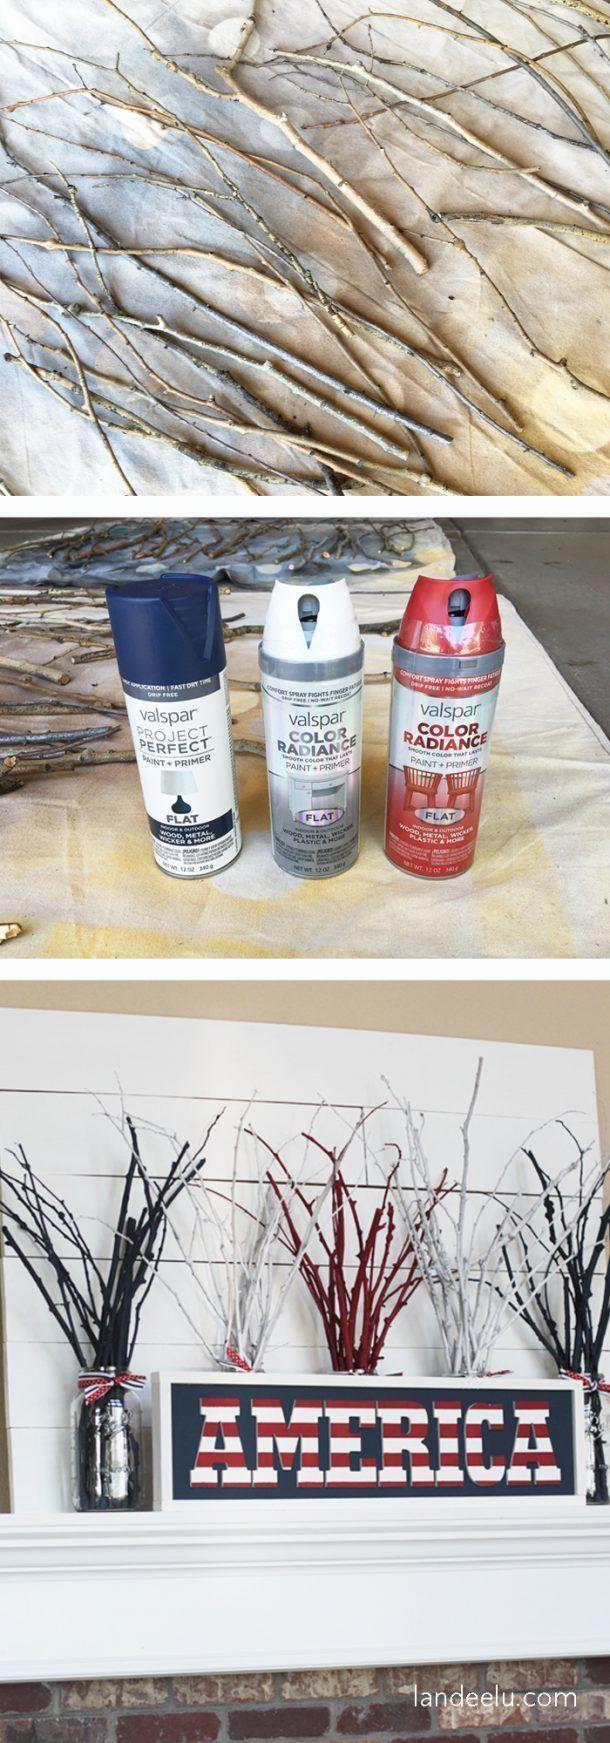 DIY 4th of July Fireworks Mantel - With Stick & Spray Paint - landeelu.com -  DIY 4th of July Firewo...